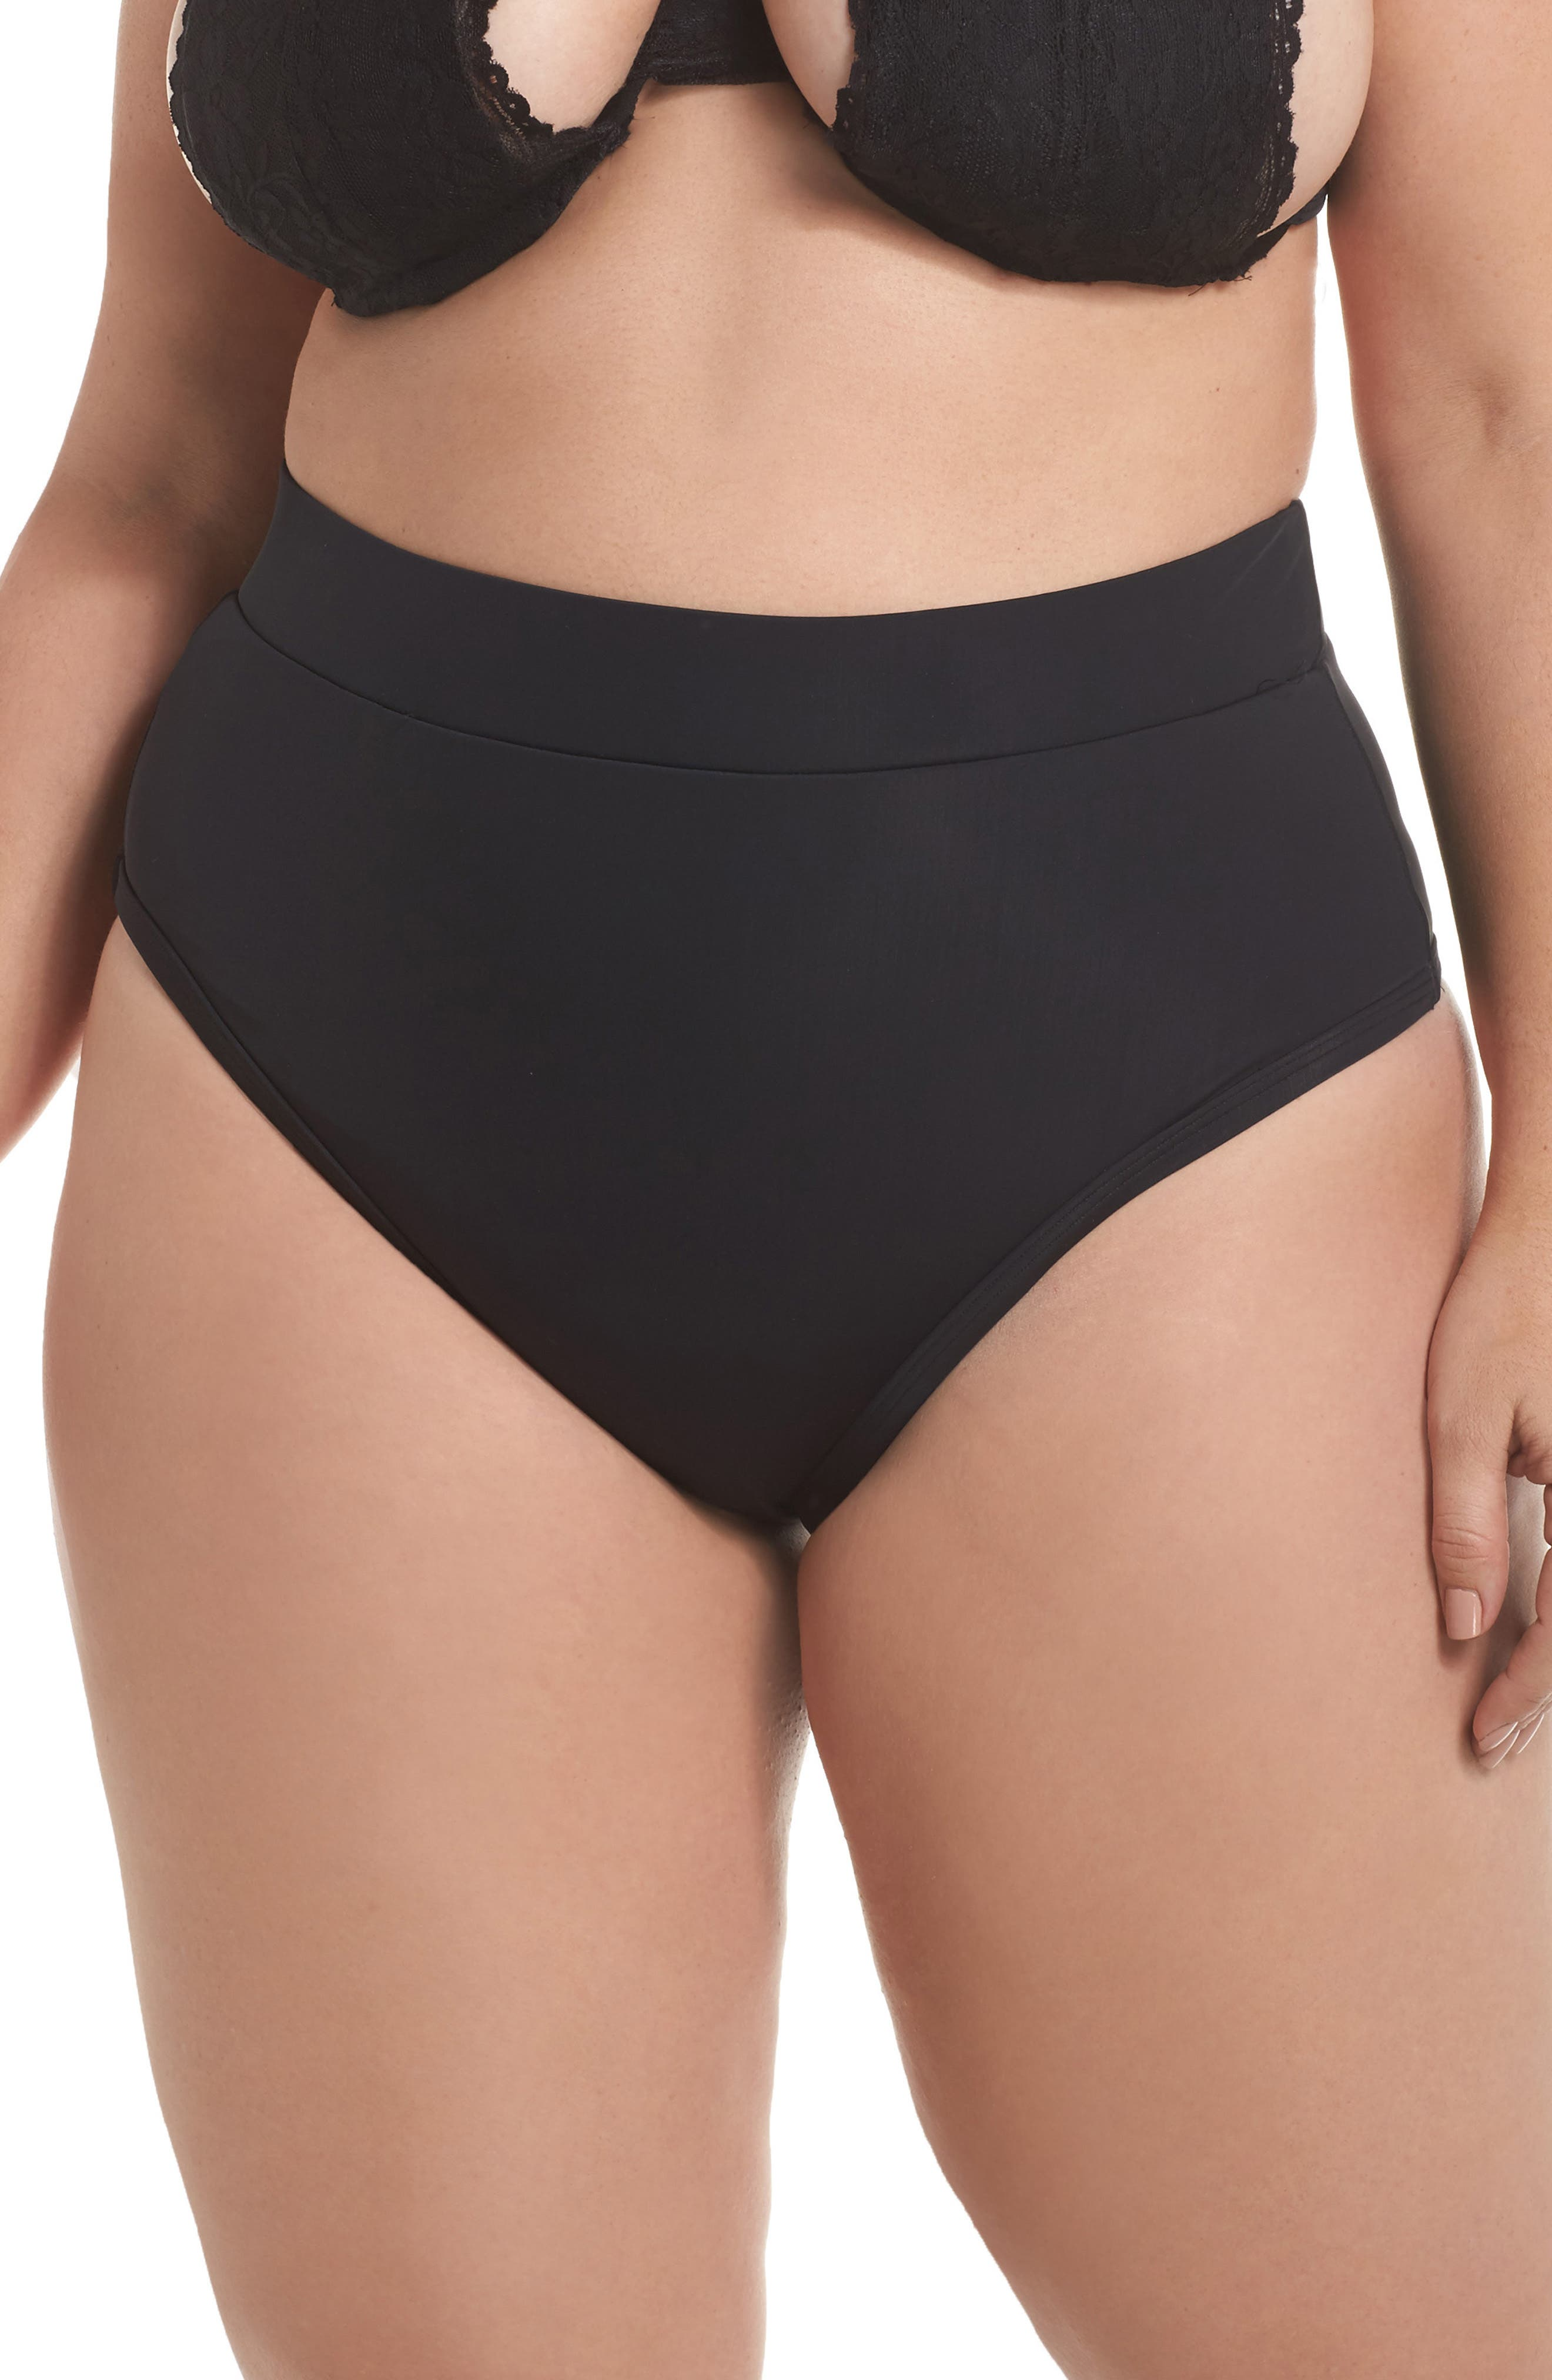 ALPINE BUTTERFLY, Lover High Waist Bikini Bottoms, Main thumbnail 1, color, BLACK